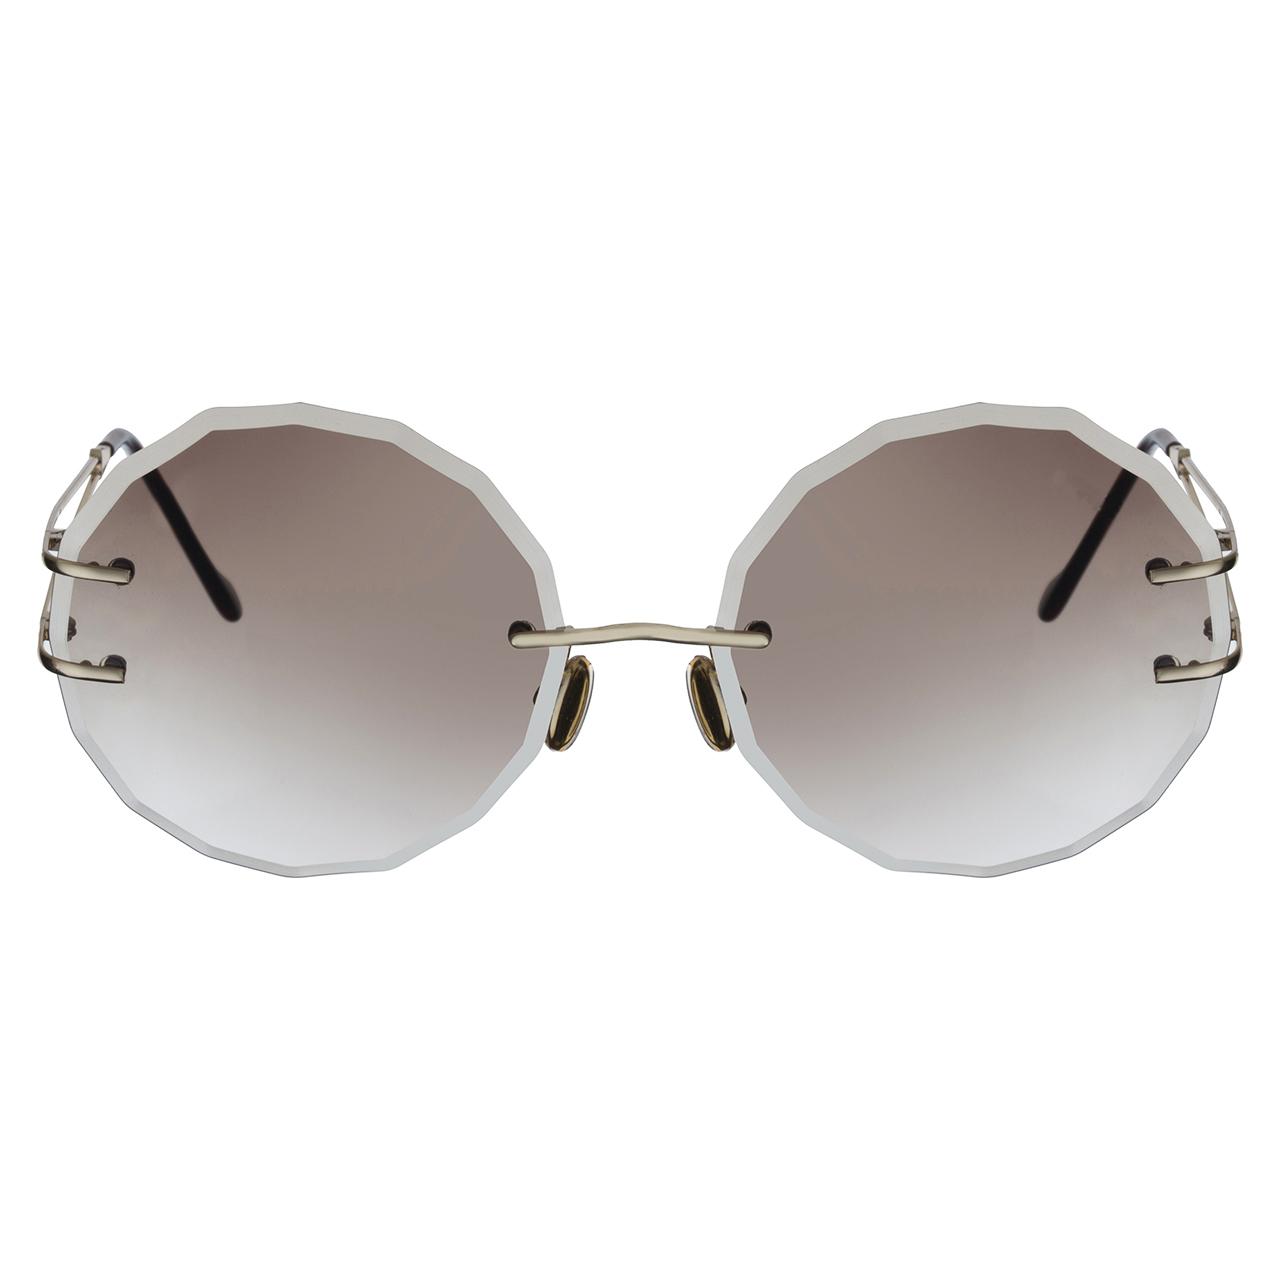 عینک آفتابی کد A001